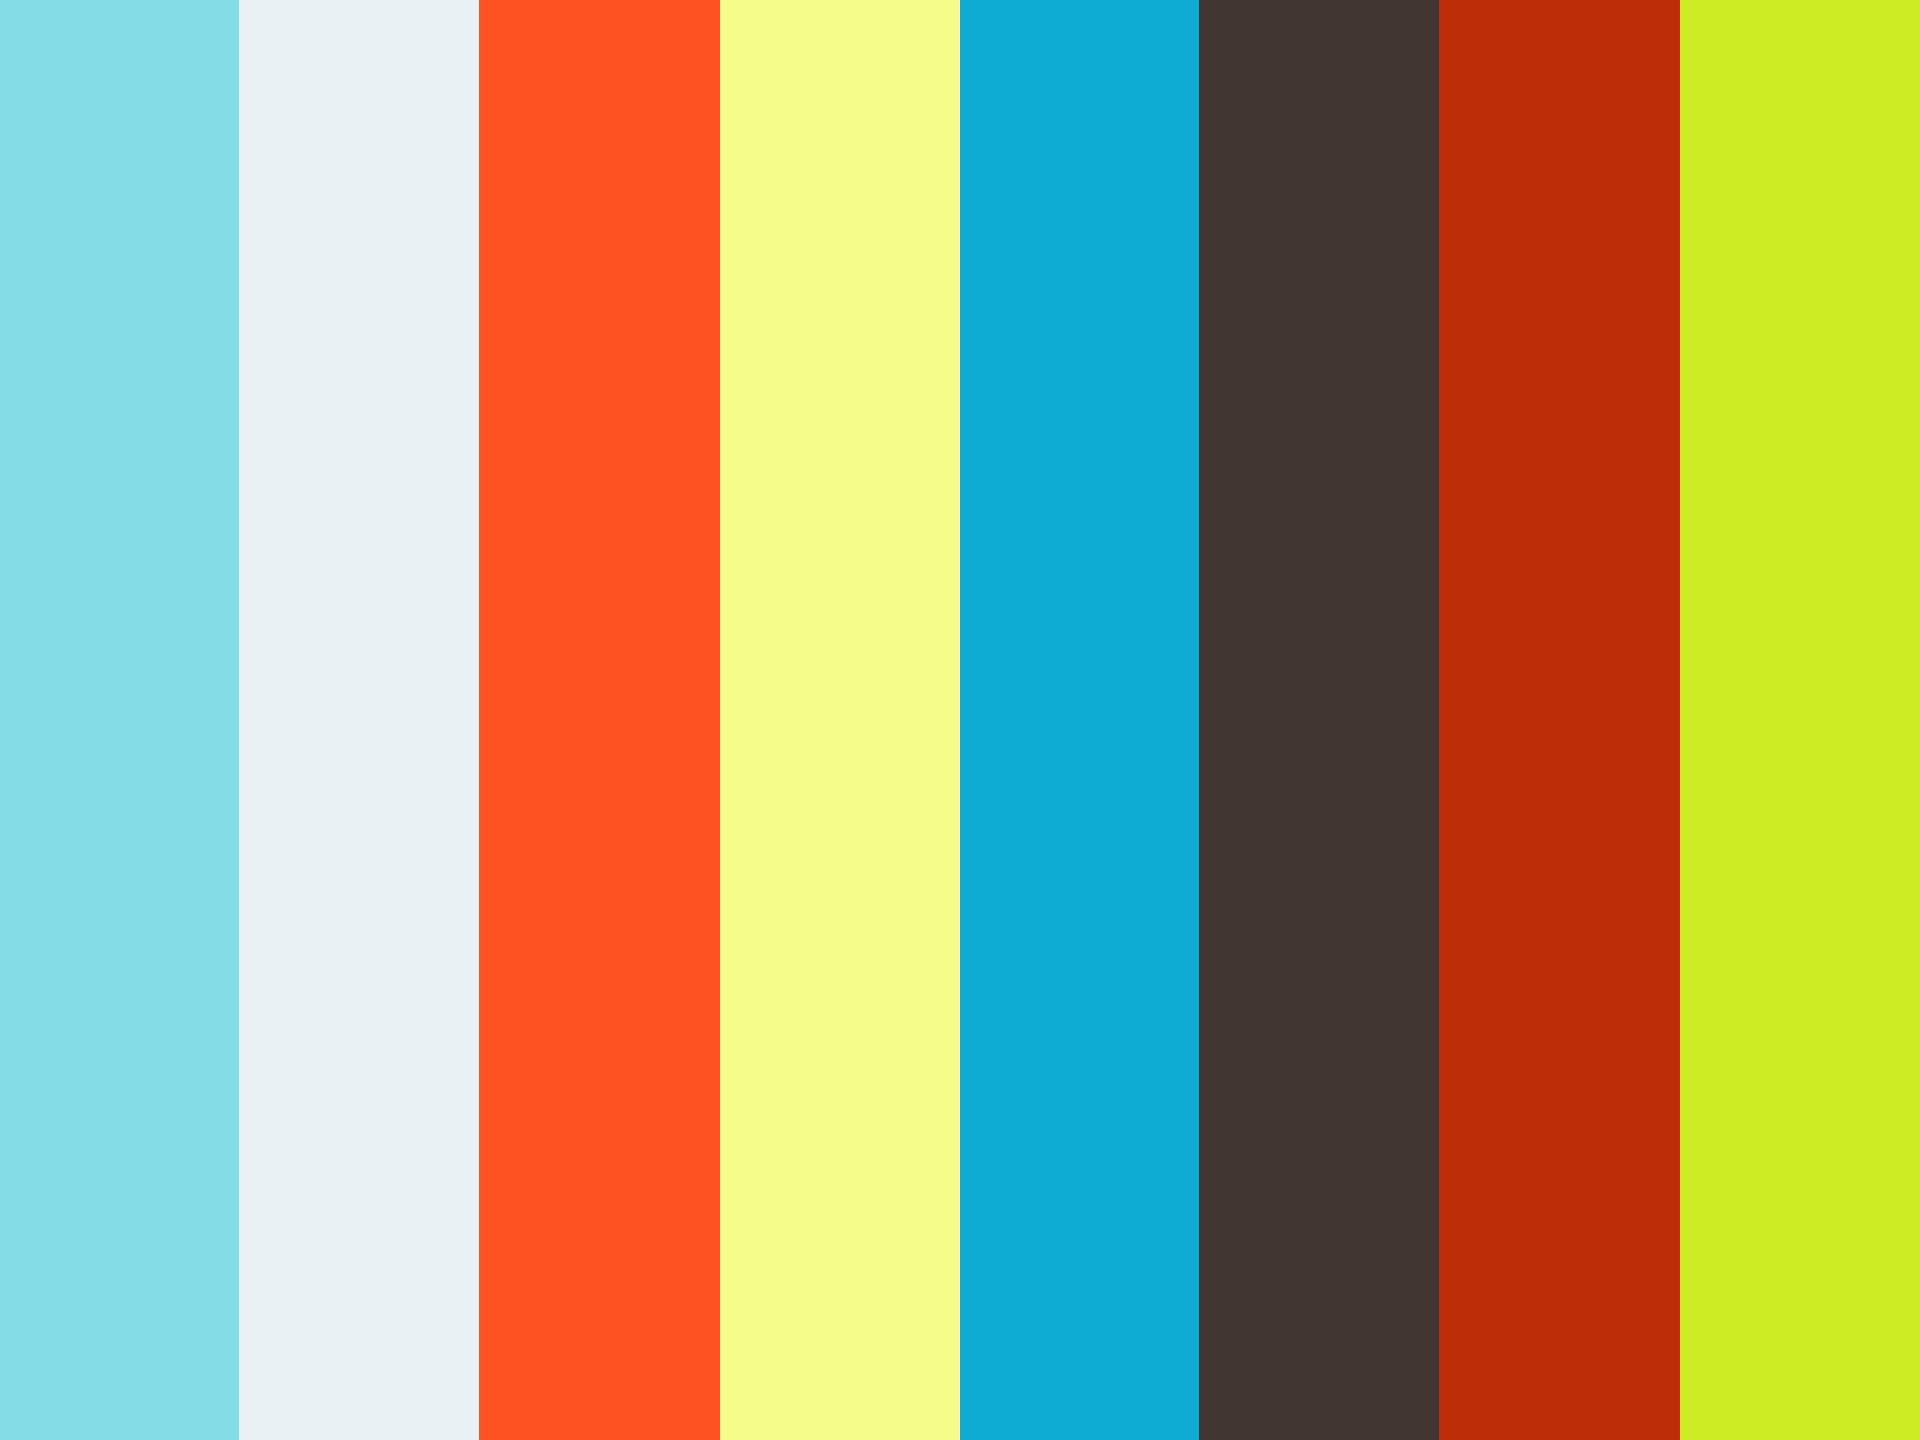 MERCEDES BENZ GTC - WHITE - 2018